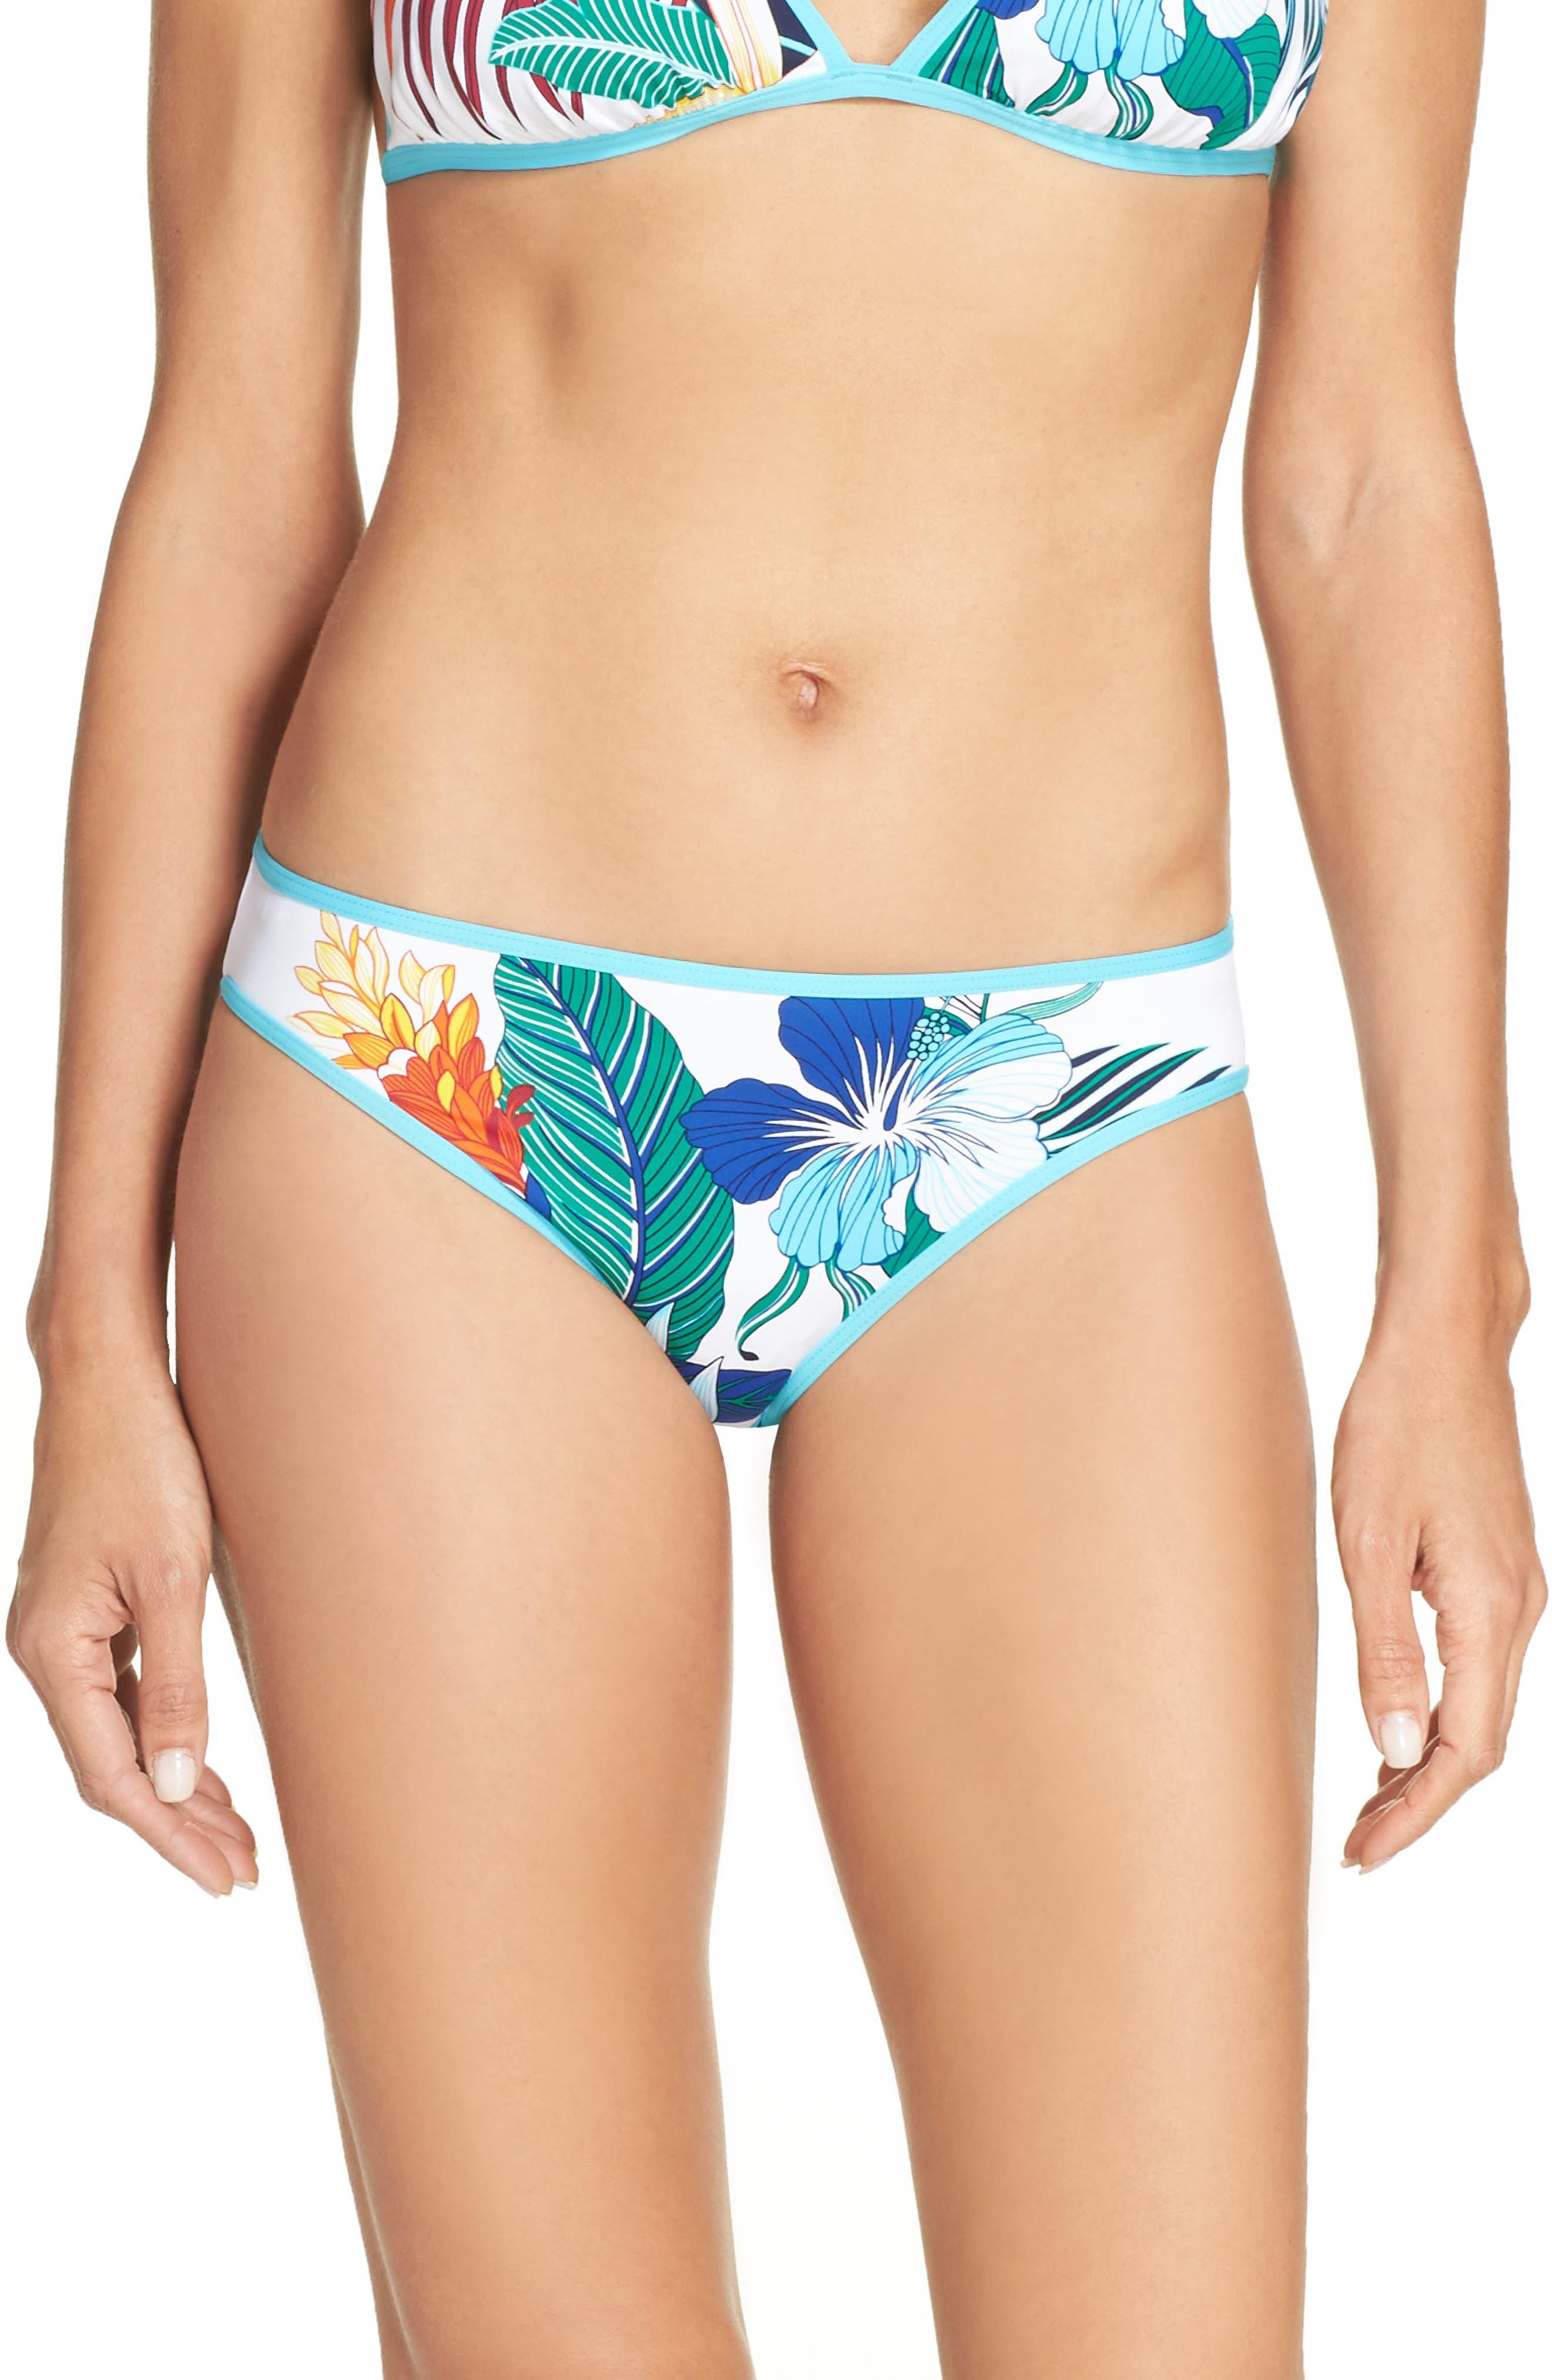 Hibiscus Print Bikini Bottoms,                             Main thumbnail 1, color,                             100